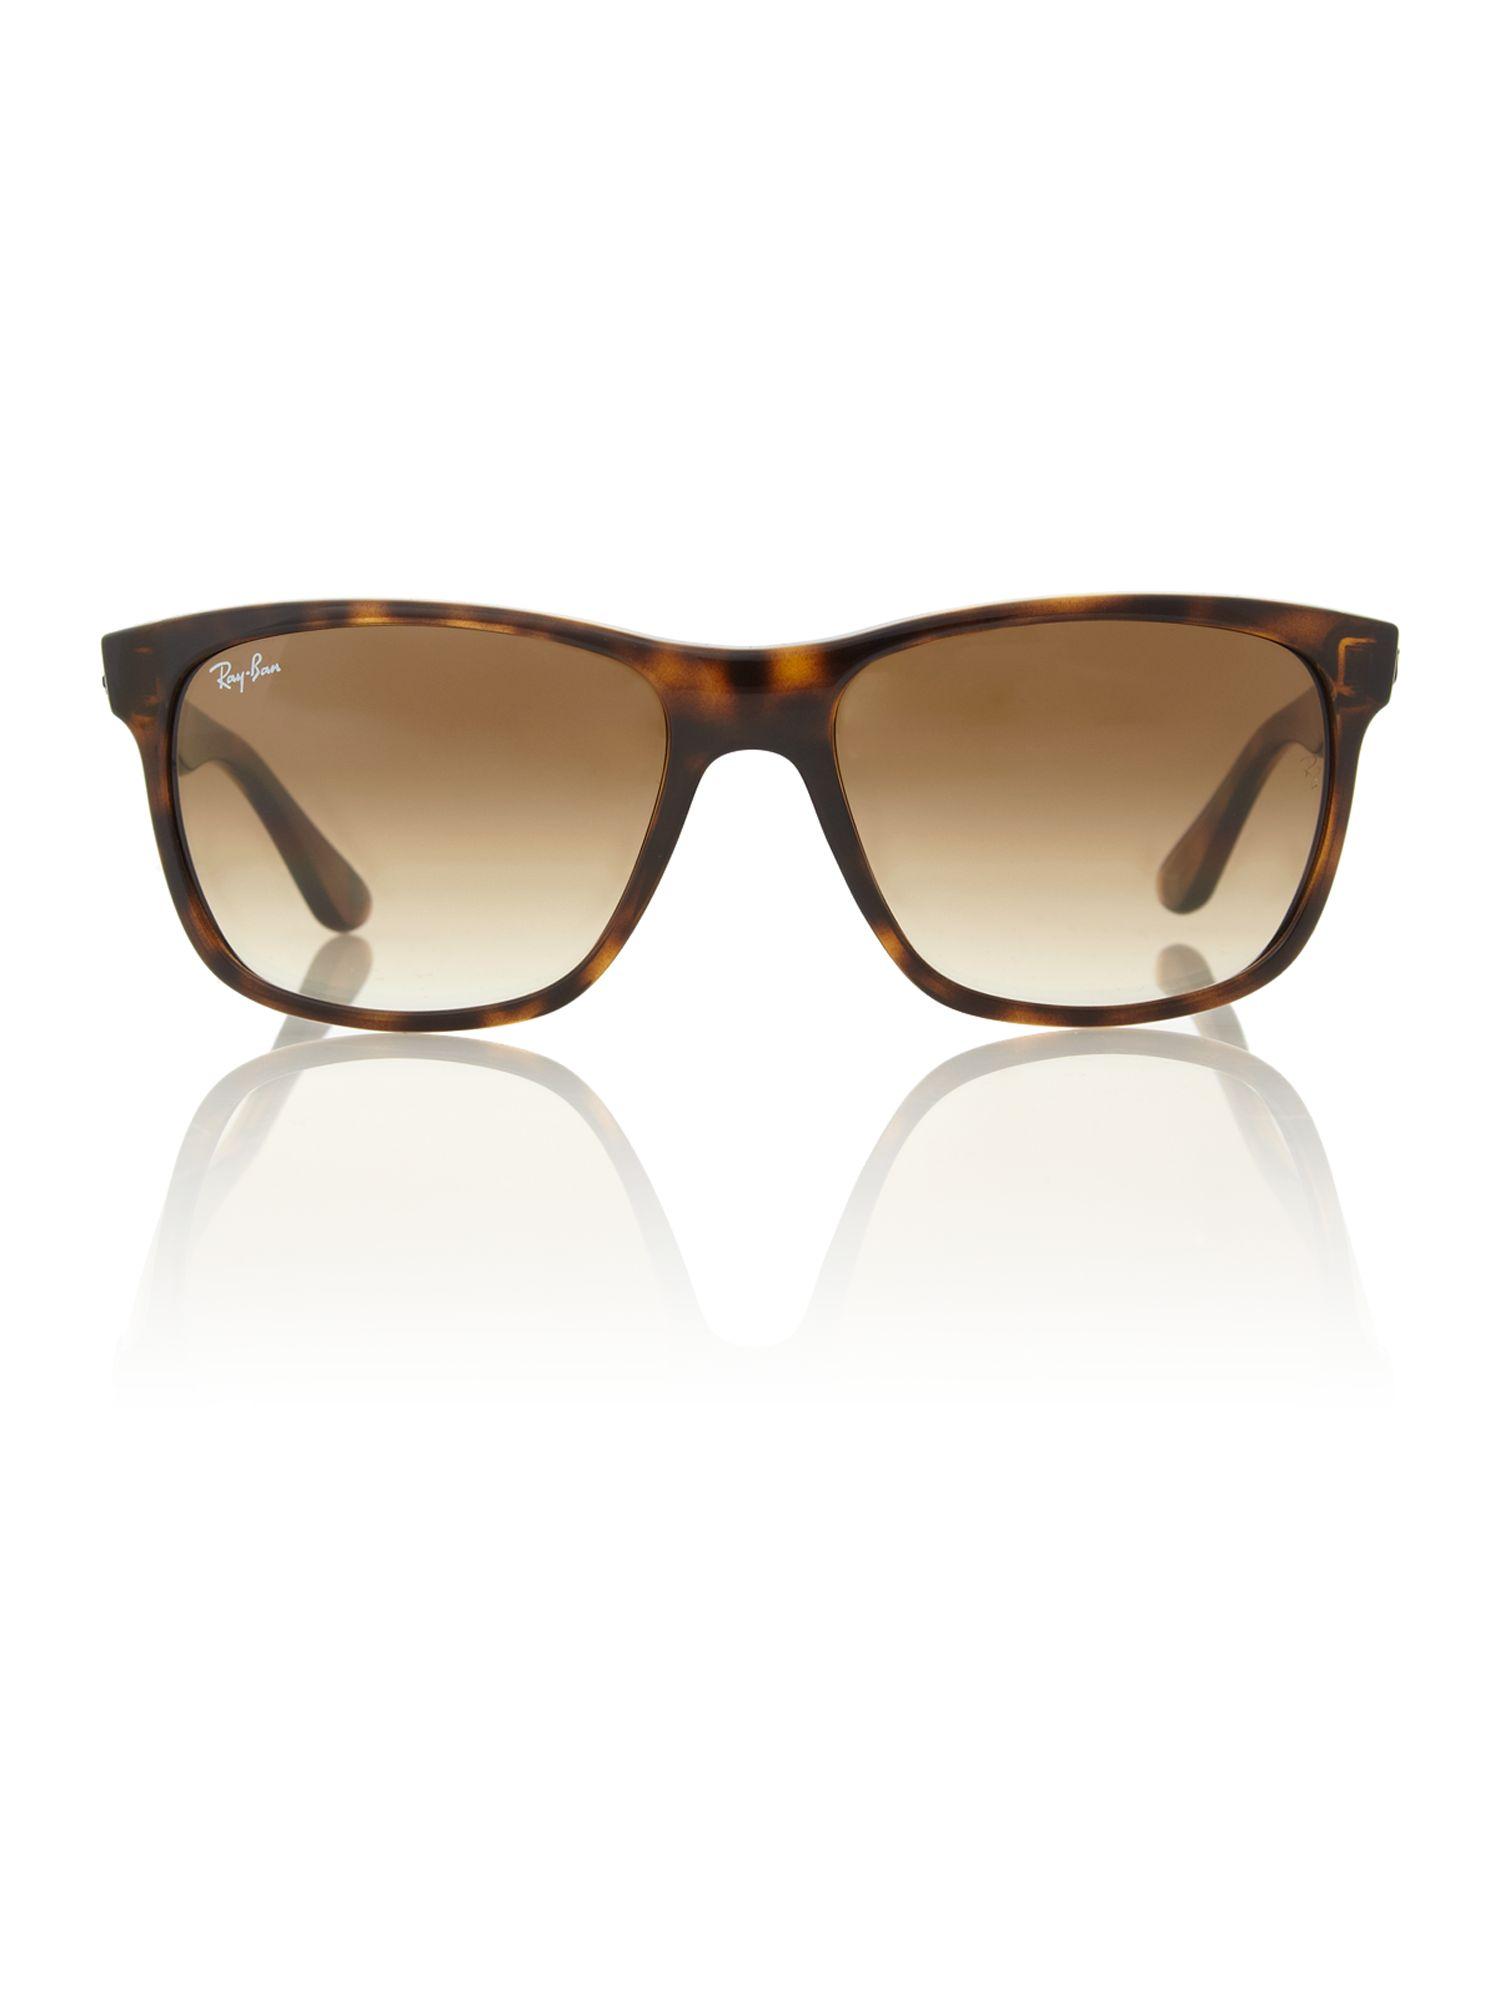 Ray Ban Havana Sunglasses  ban havana sunglasses